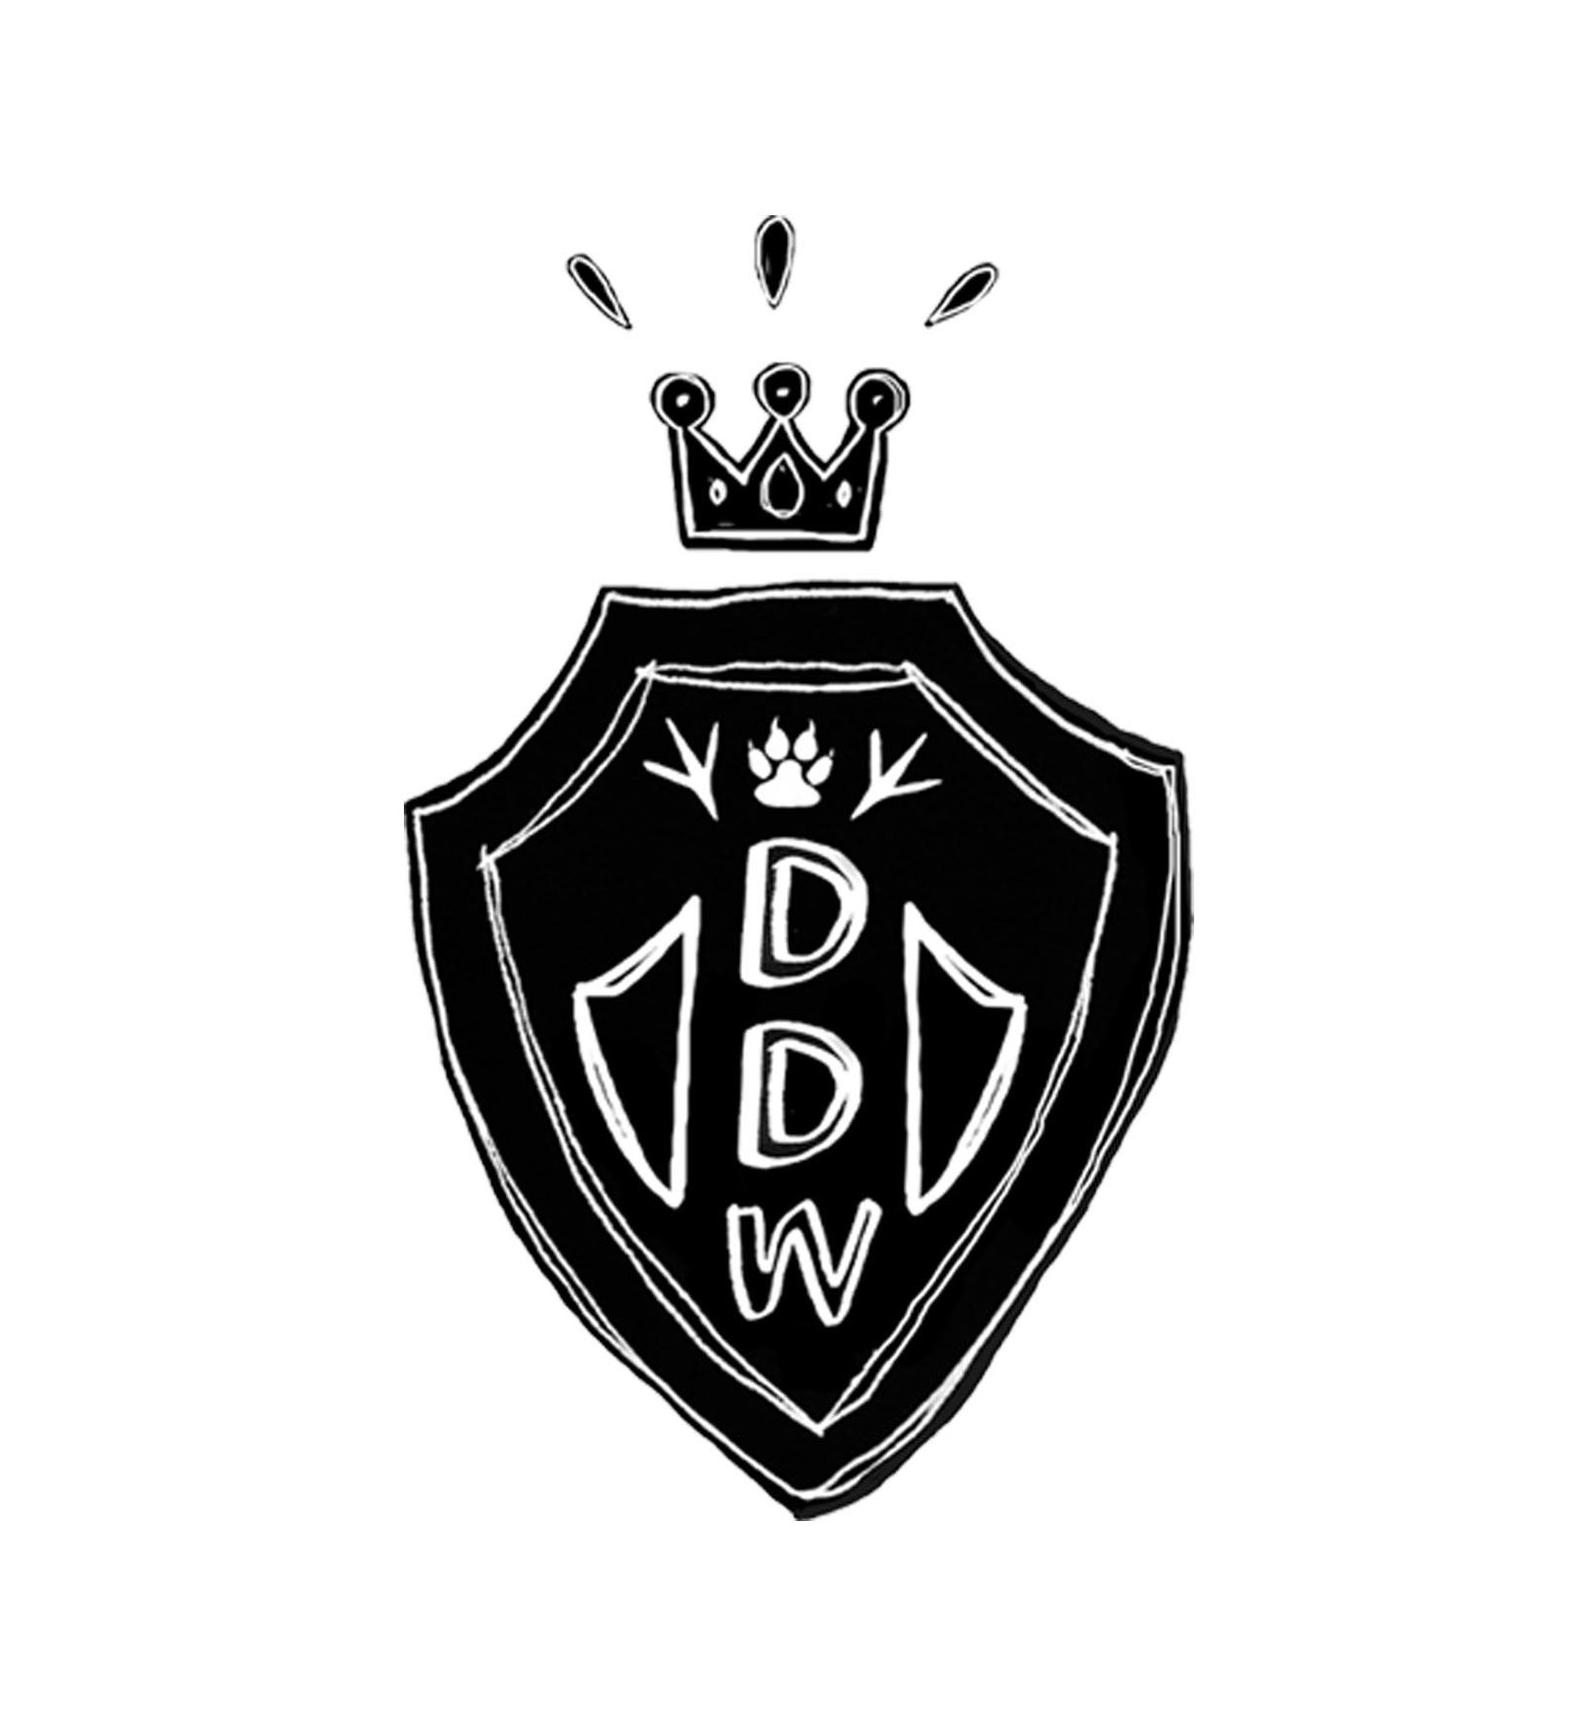 DDW_black and white logo by Deanna First.jpg